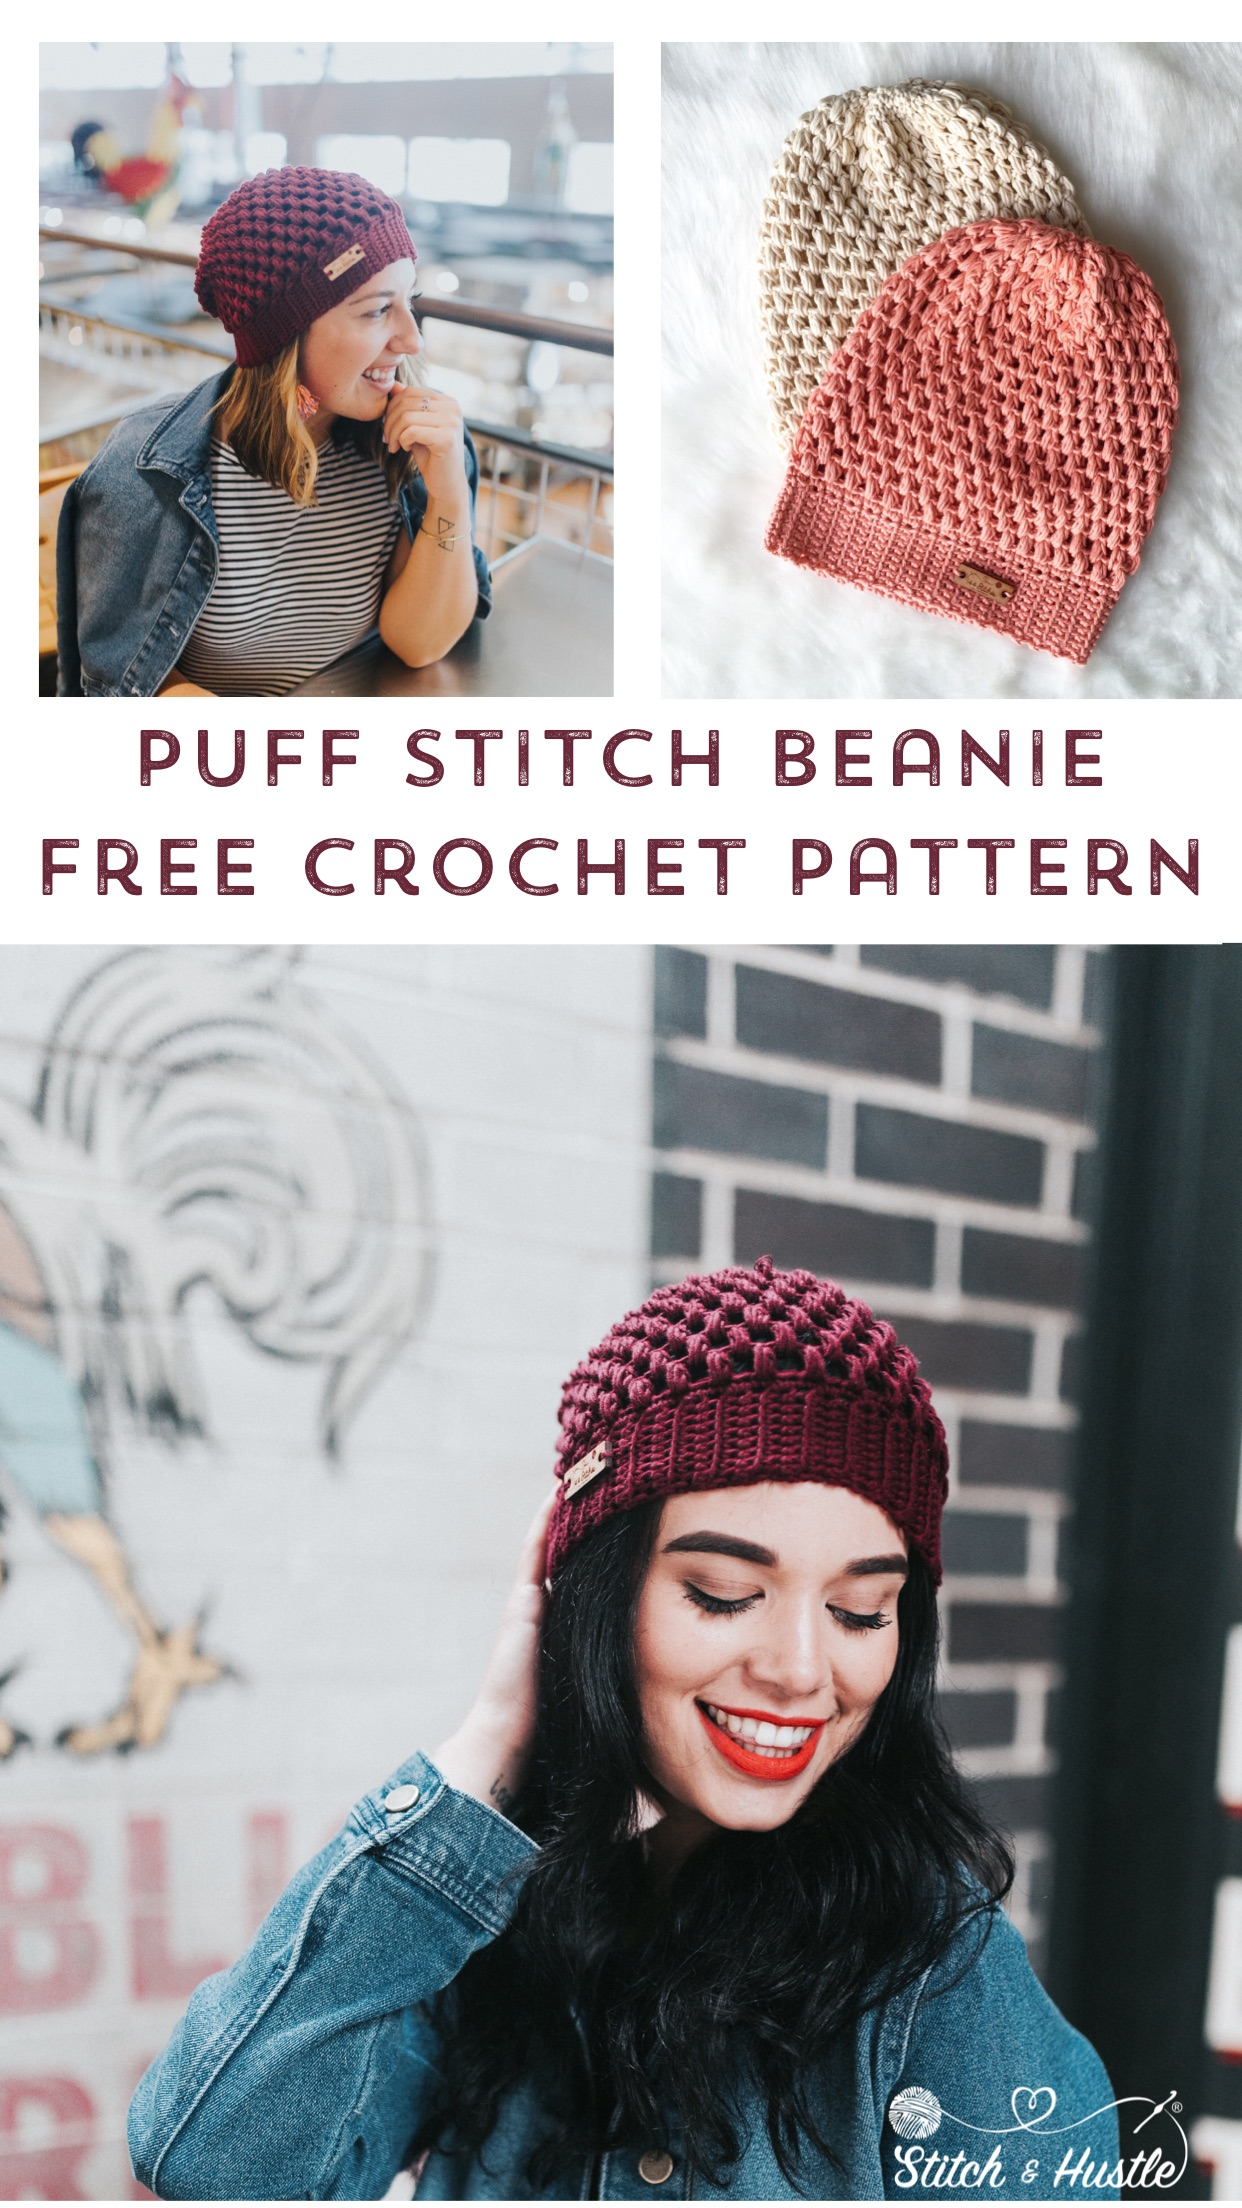 puff_stitch_slouchy_beanie_free_crochet_pattern_1.jpg